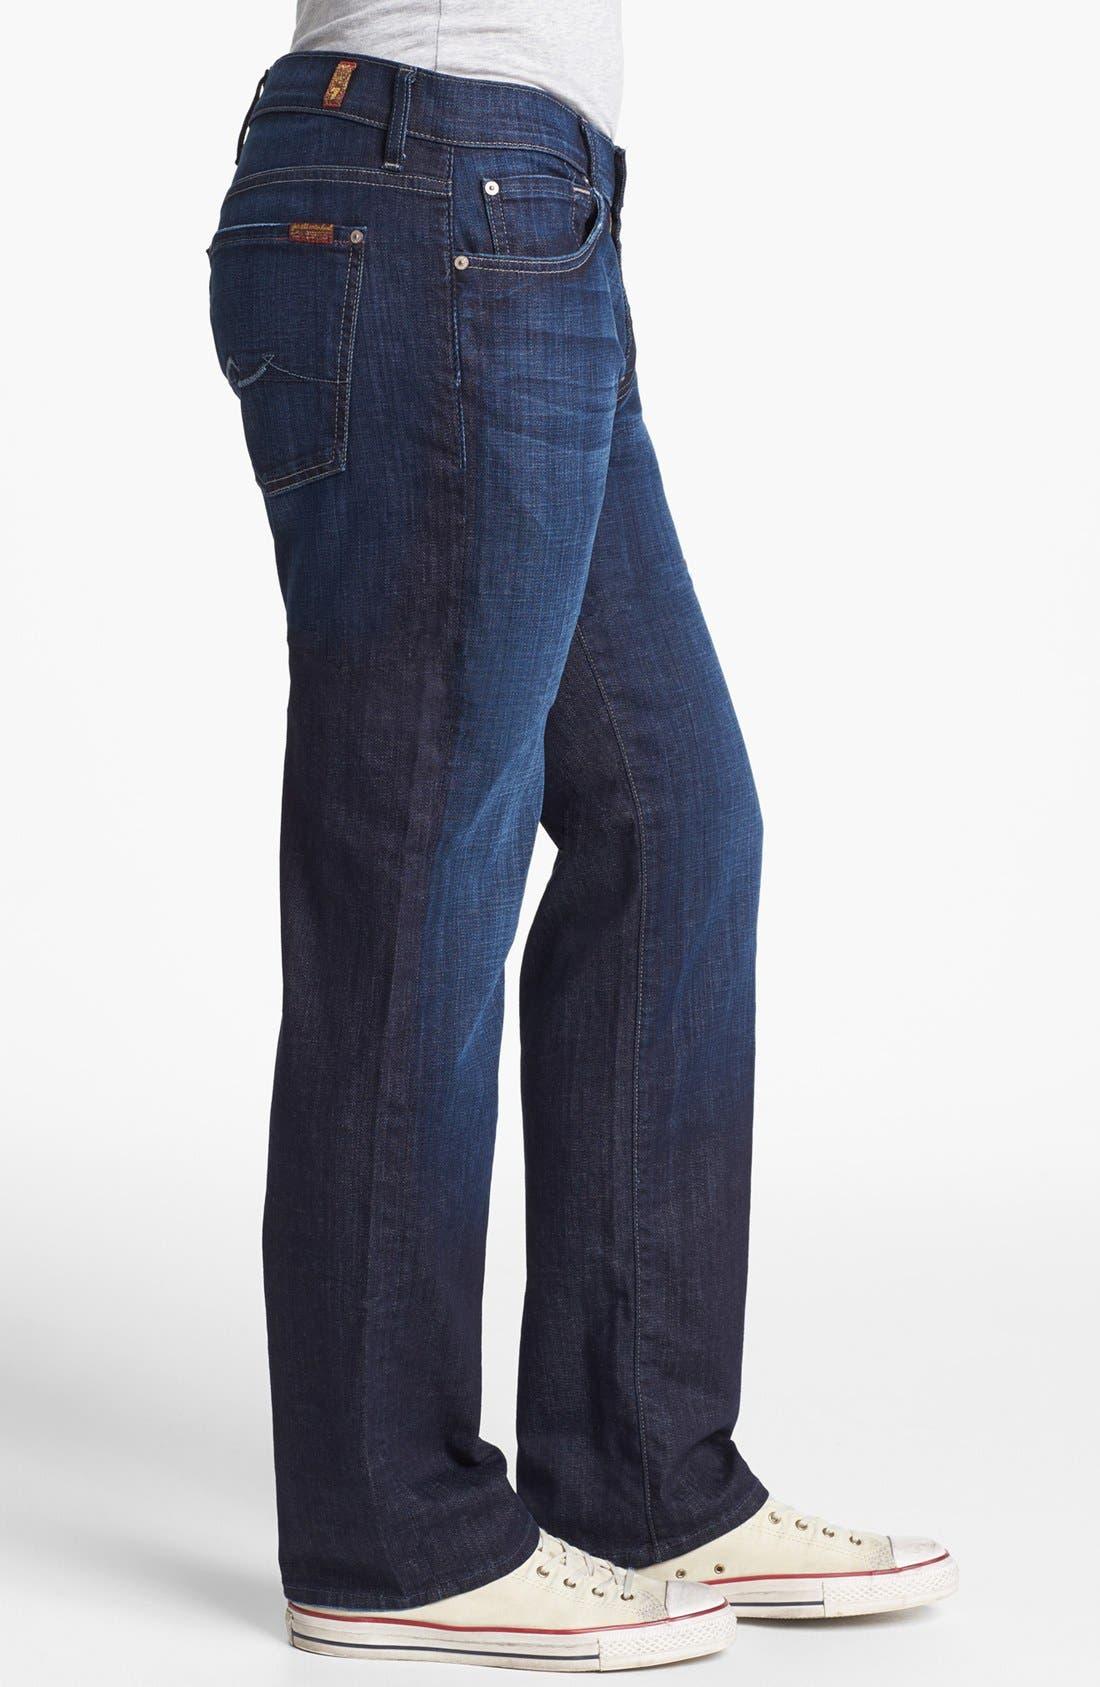 Austyn Relaxed Straight Leg Jeans,                             Alternate thumbnail 4, color,                             LOS ANGELES DARK